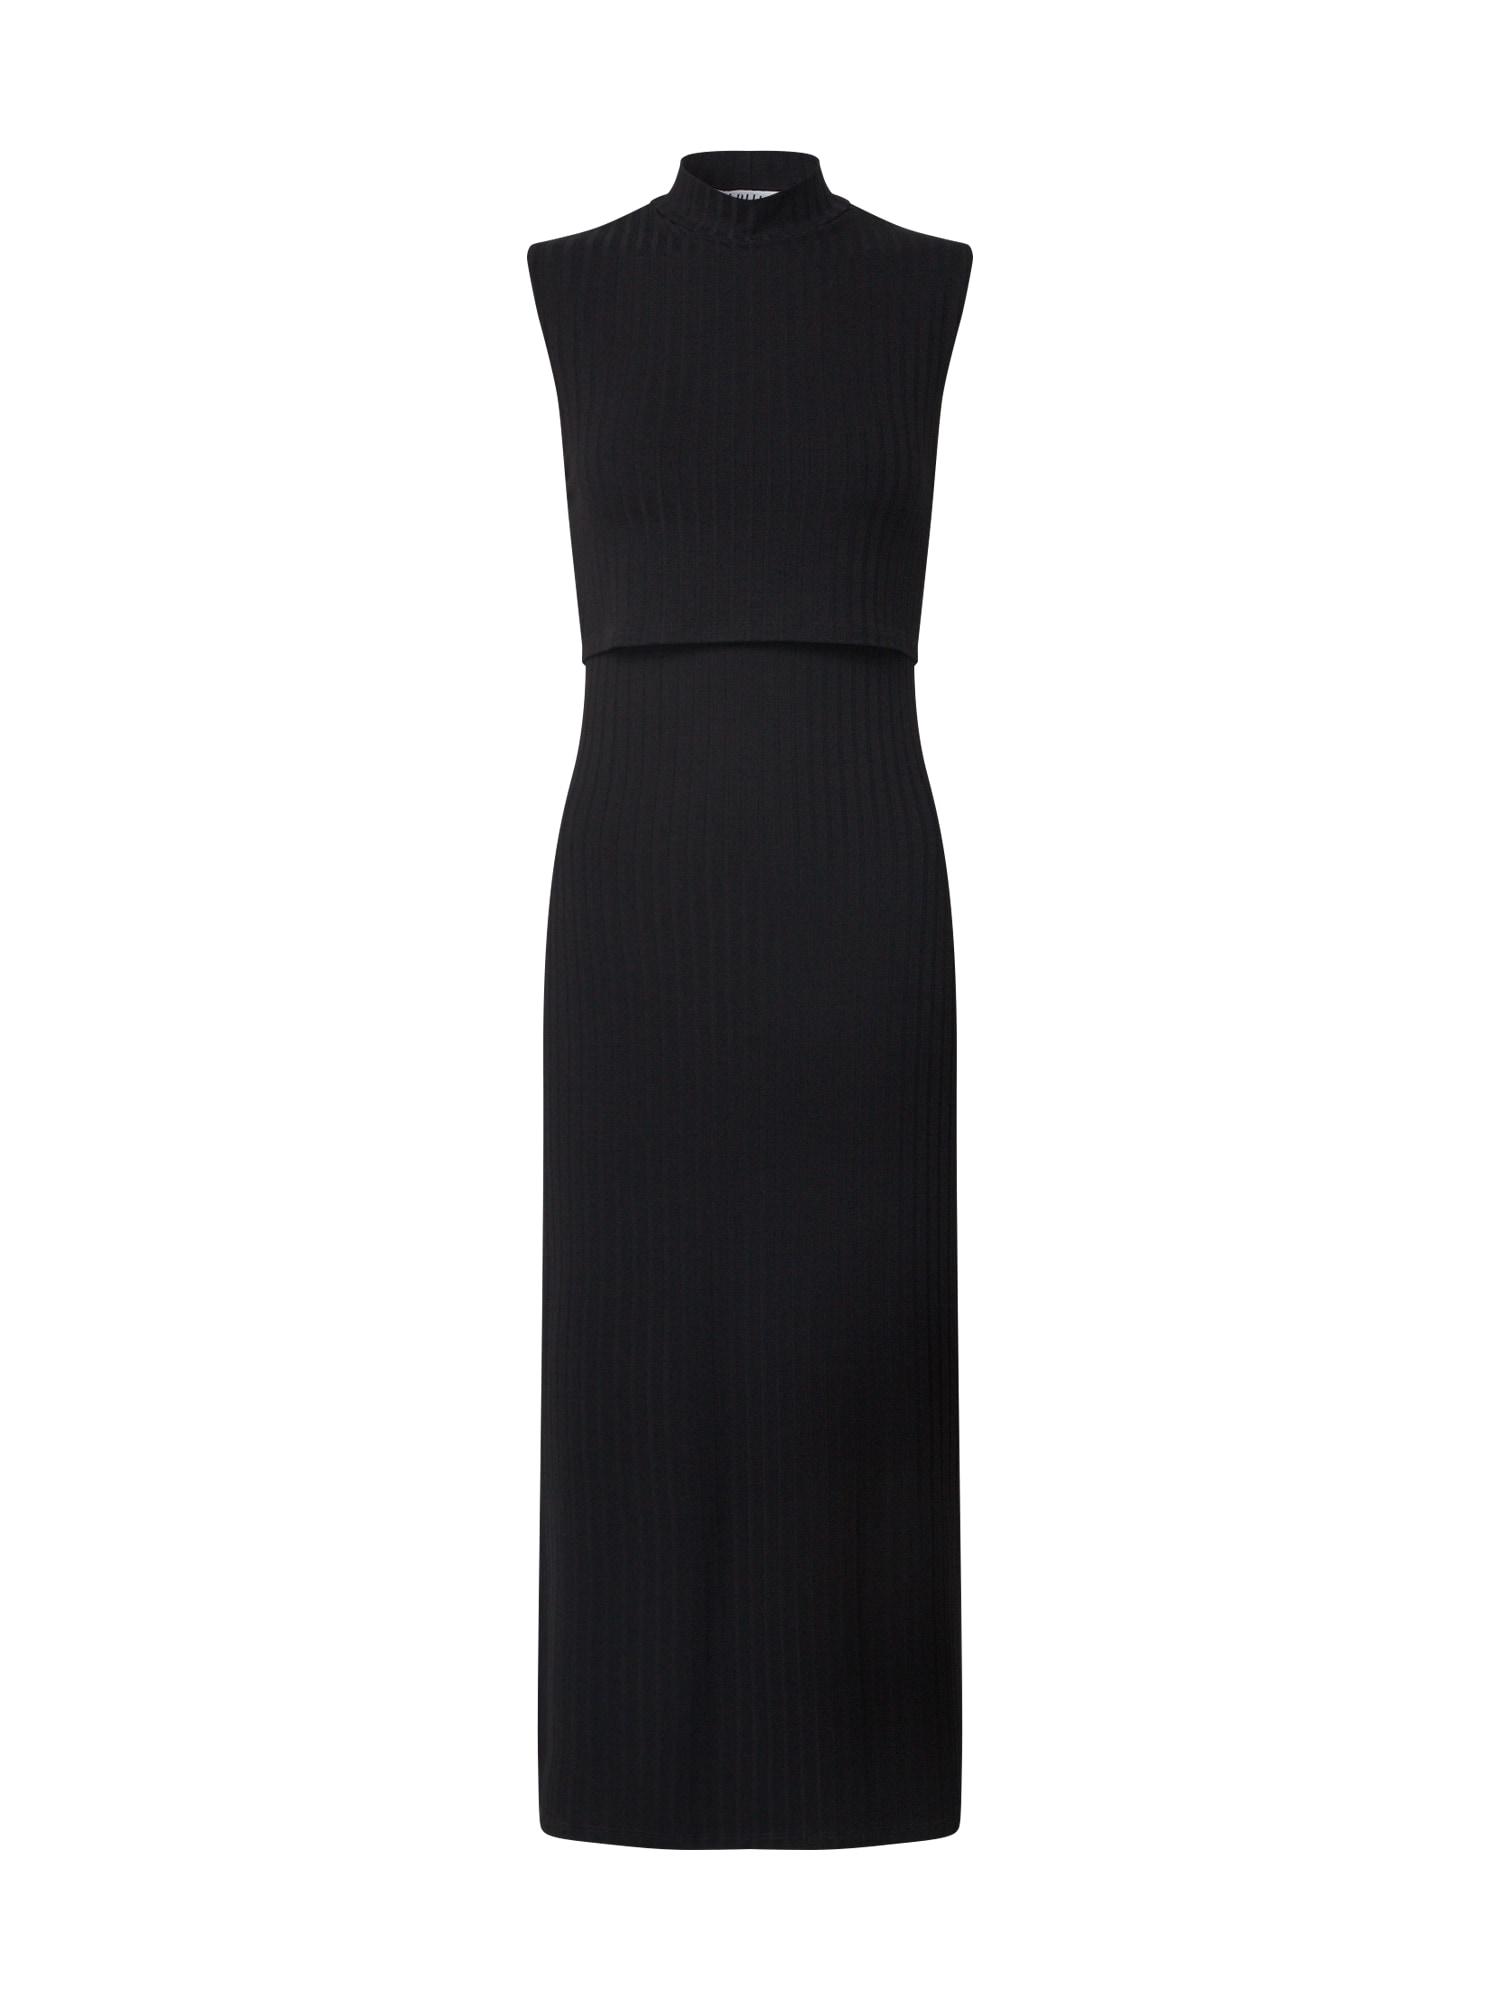 EDITED Suknelė 'Chayenne' juoda